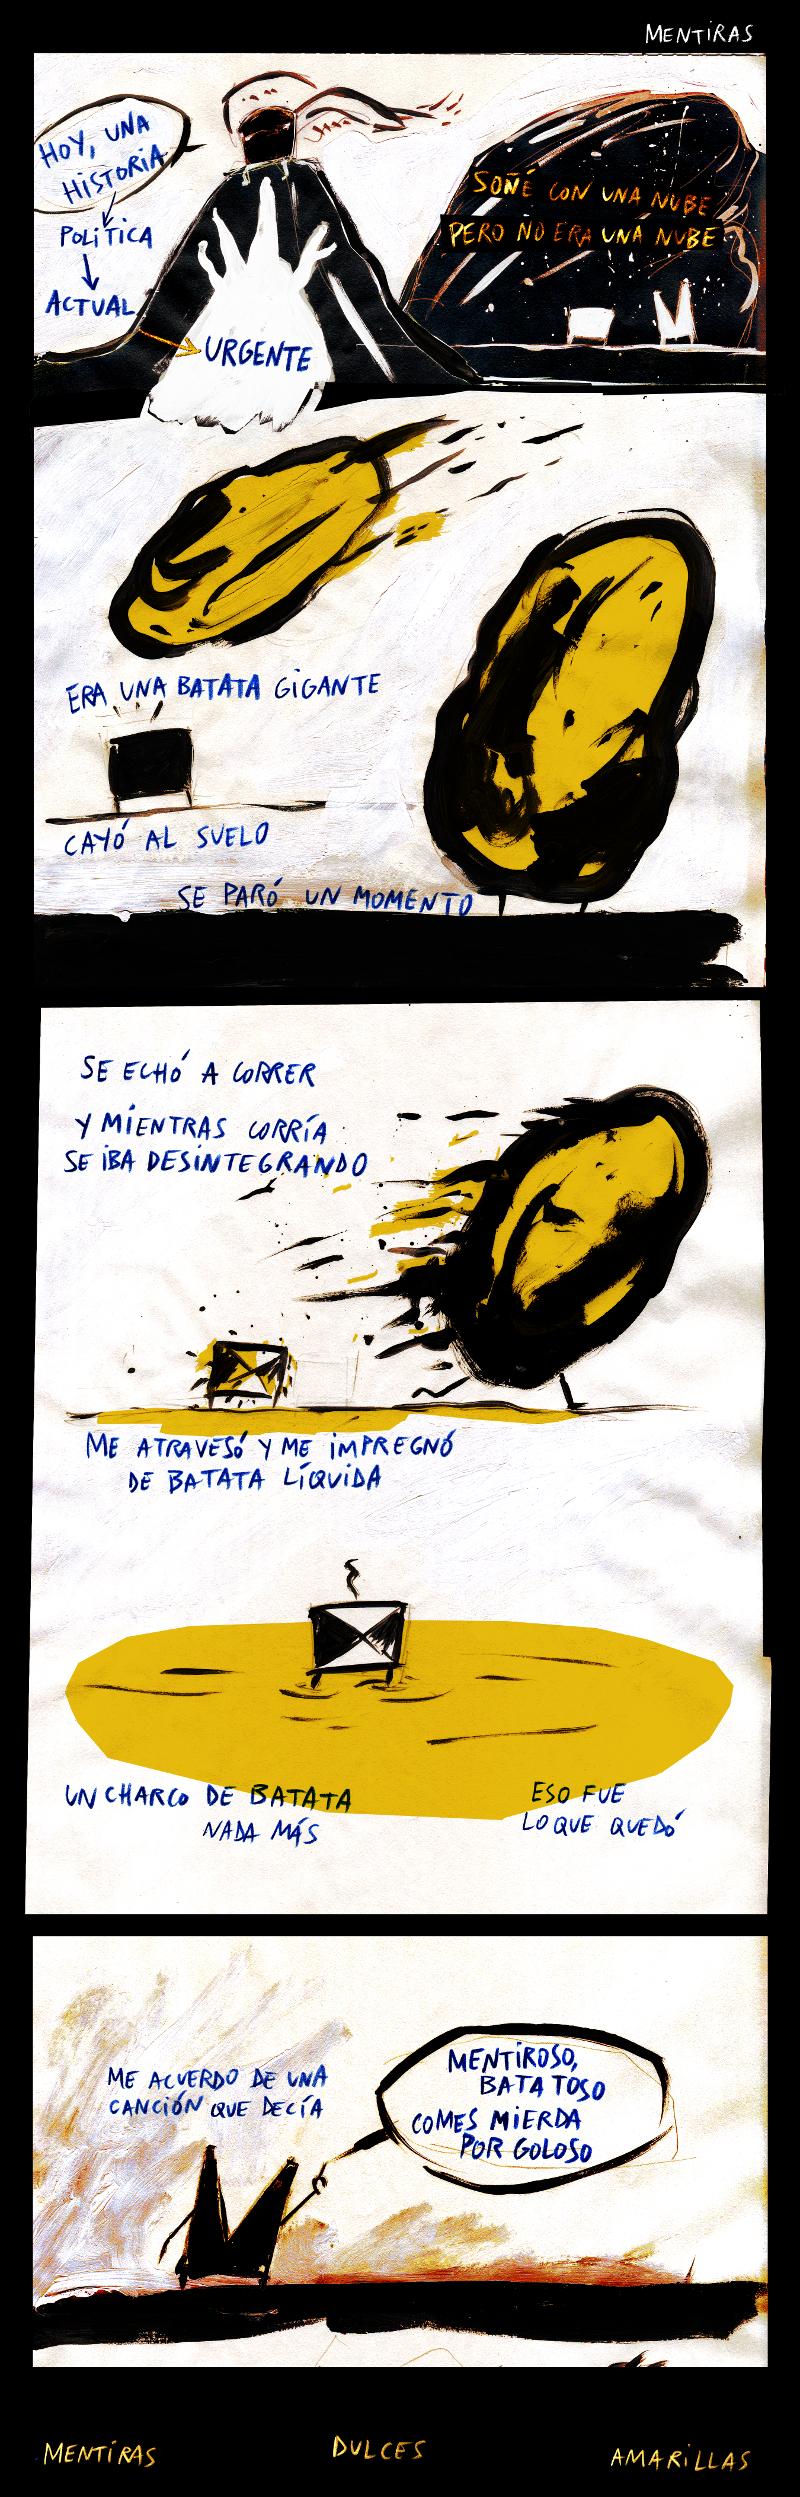 Mentiras comic espinita mataparda